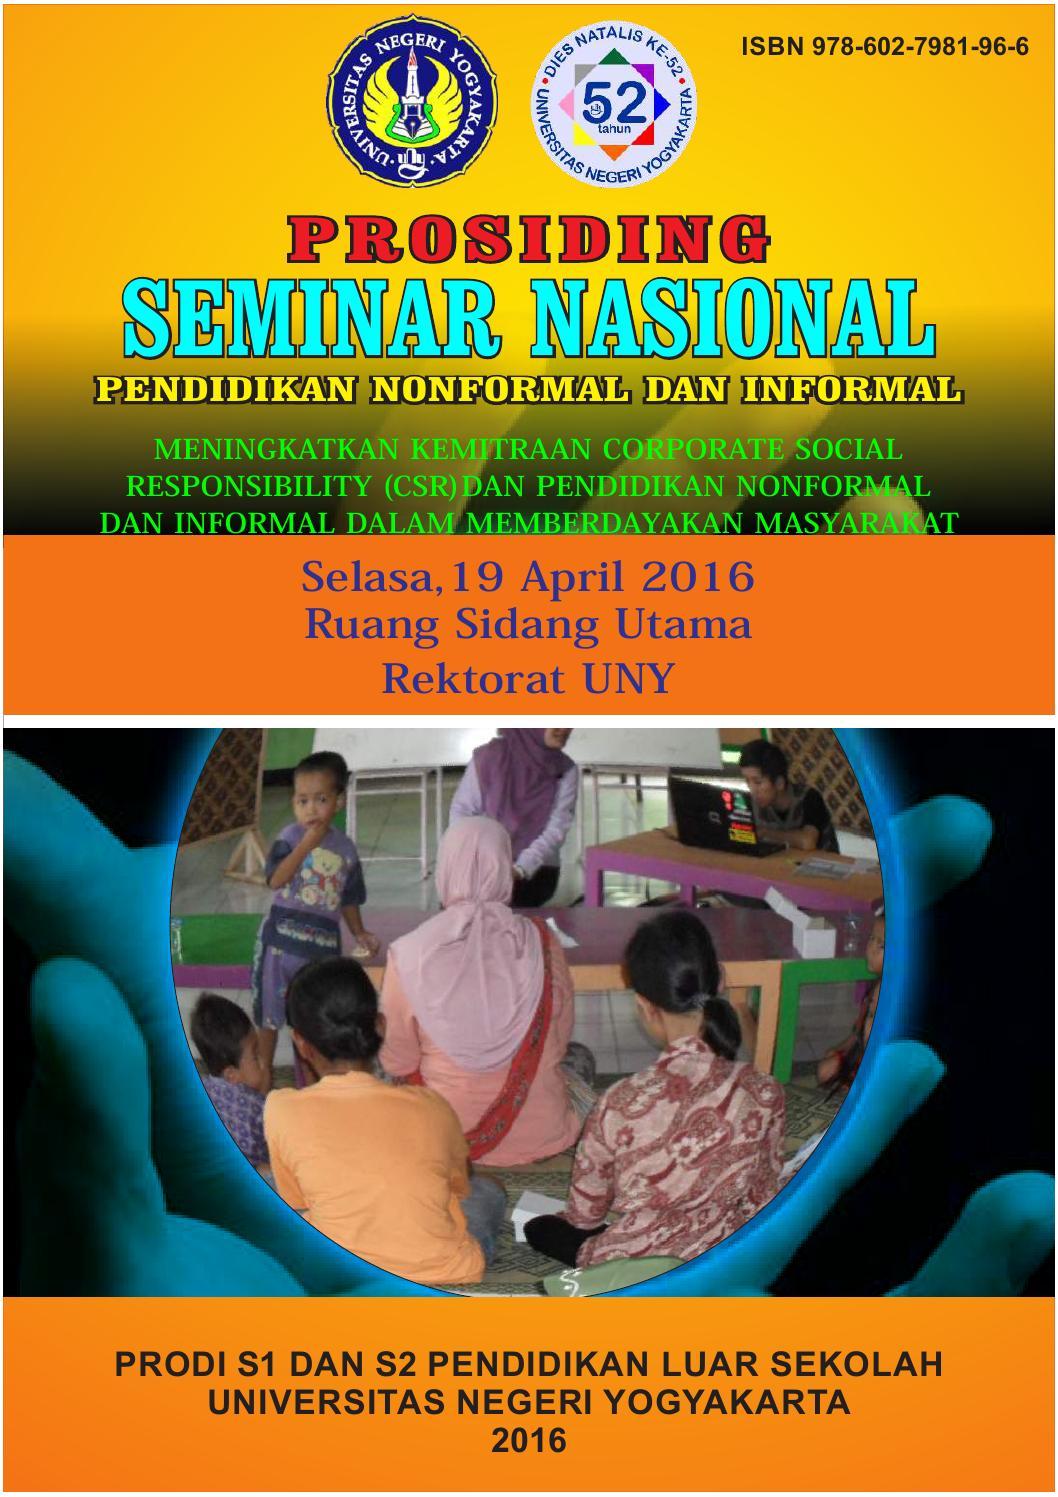 Prosiding Seminar Nasional Pnfi 2016 Univeristas Negeri Yogyakarta Keripik Singkong By Nyamen Pgp Pls Fip Uny Issuu